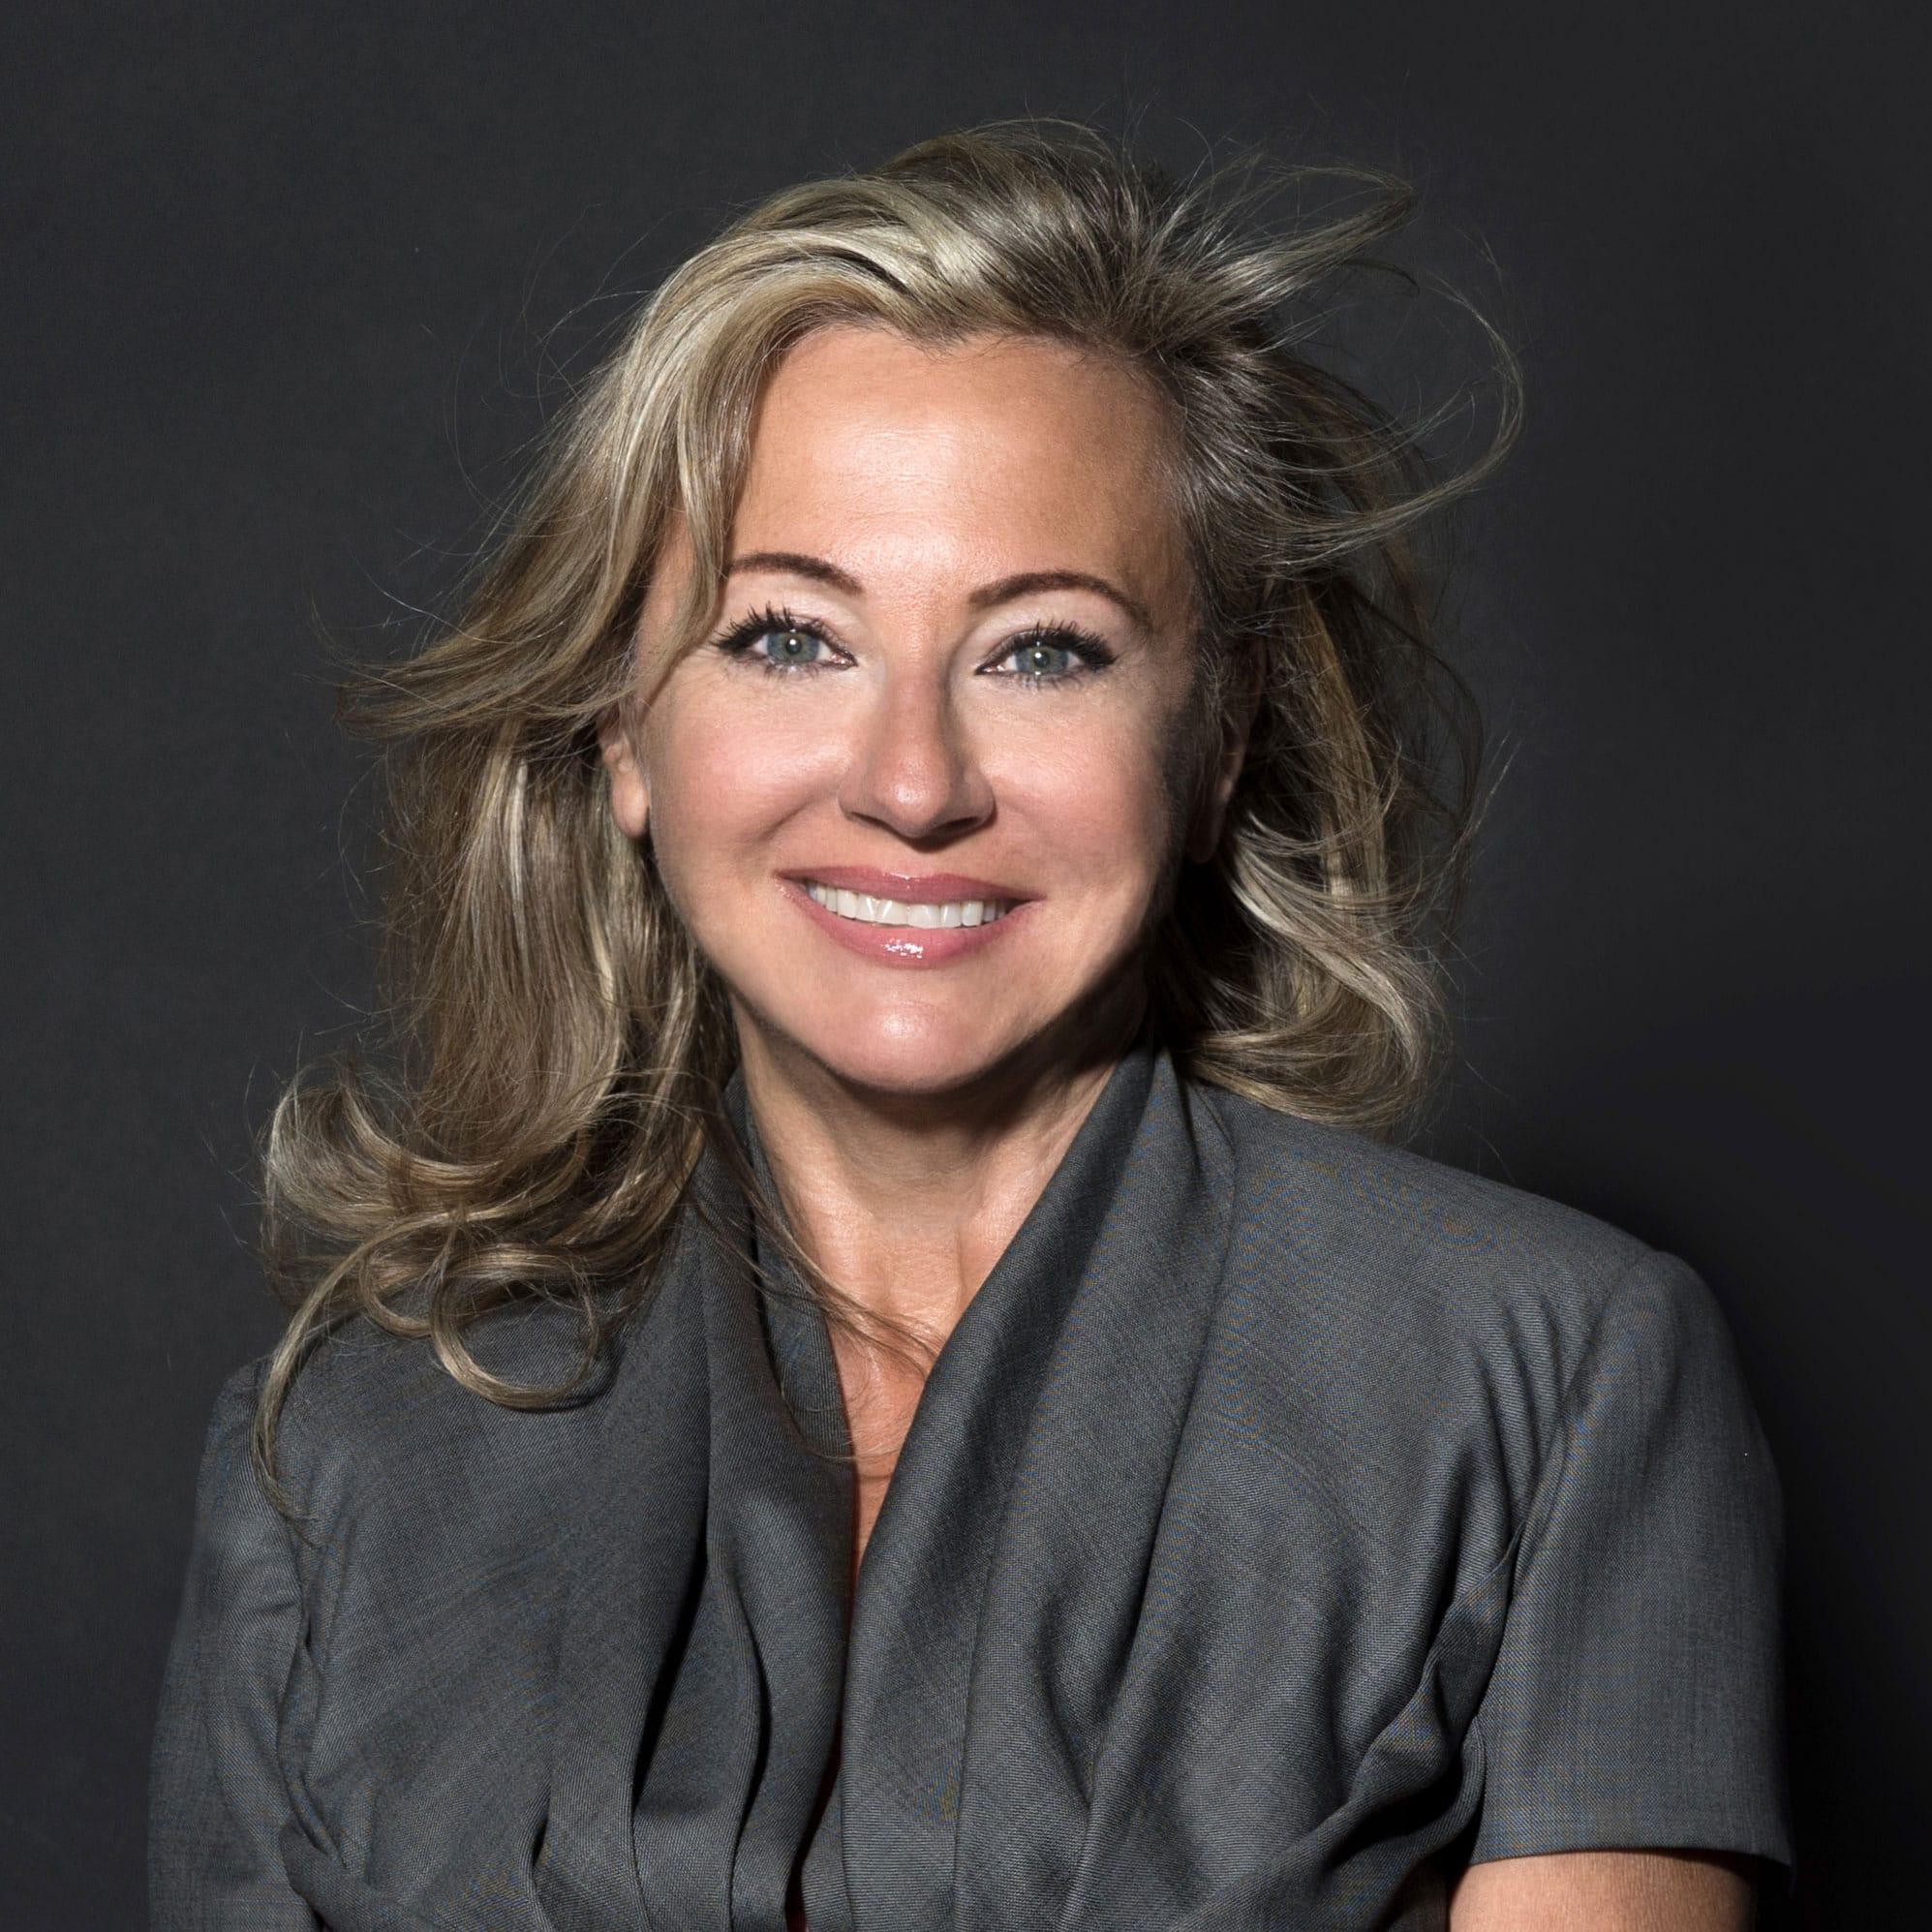 Anne Mazoyer-Jankowska